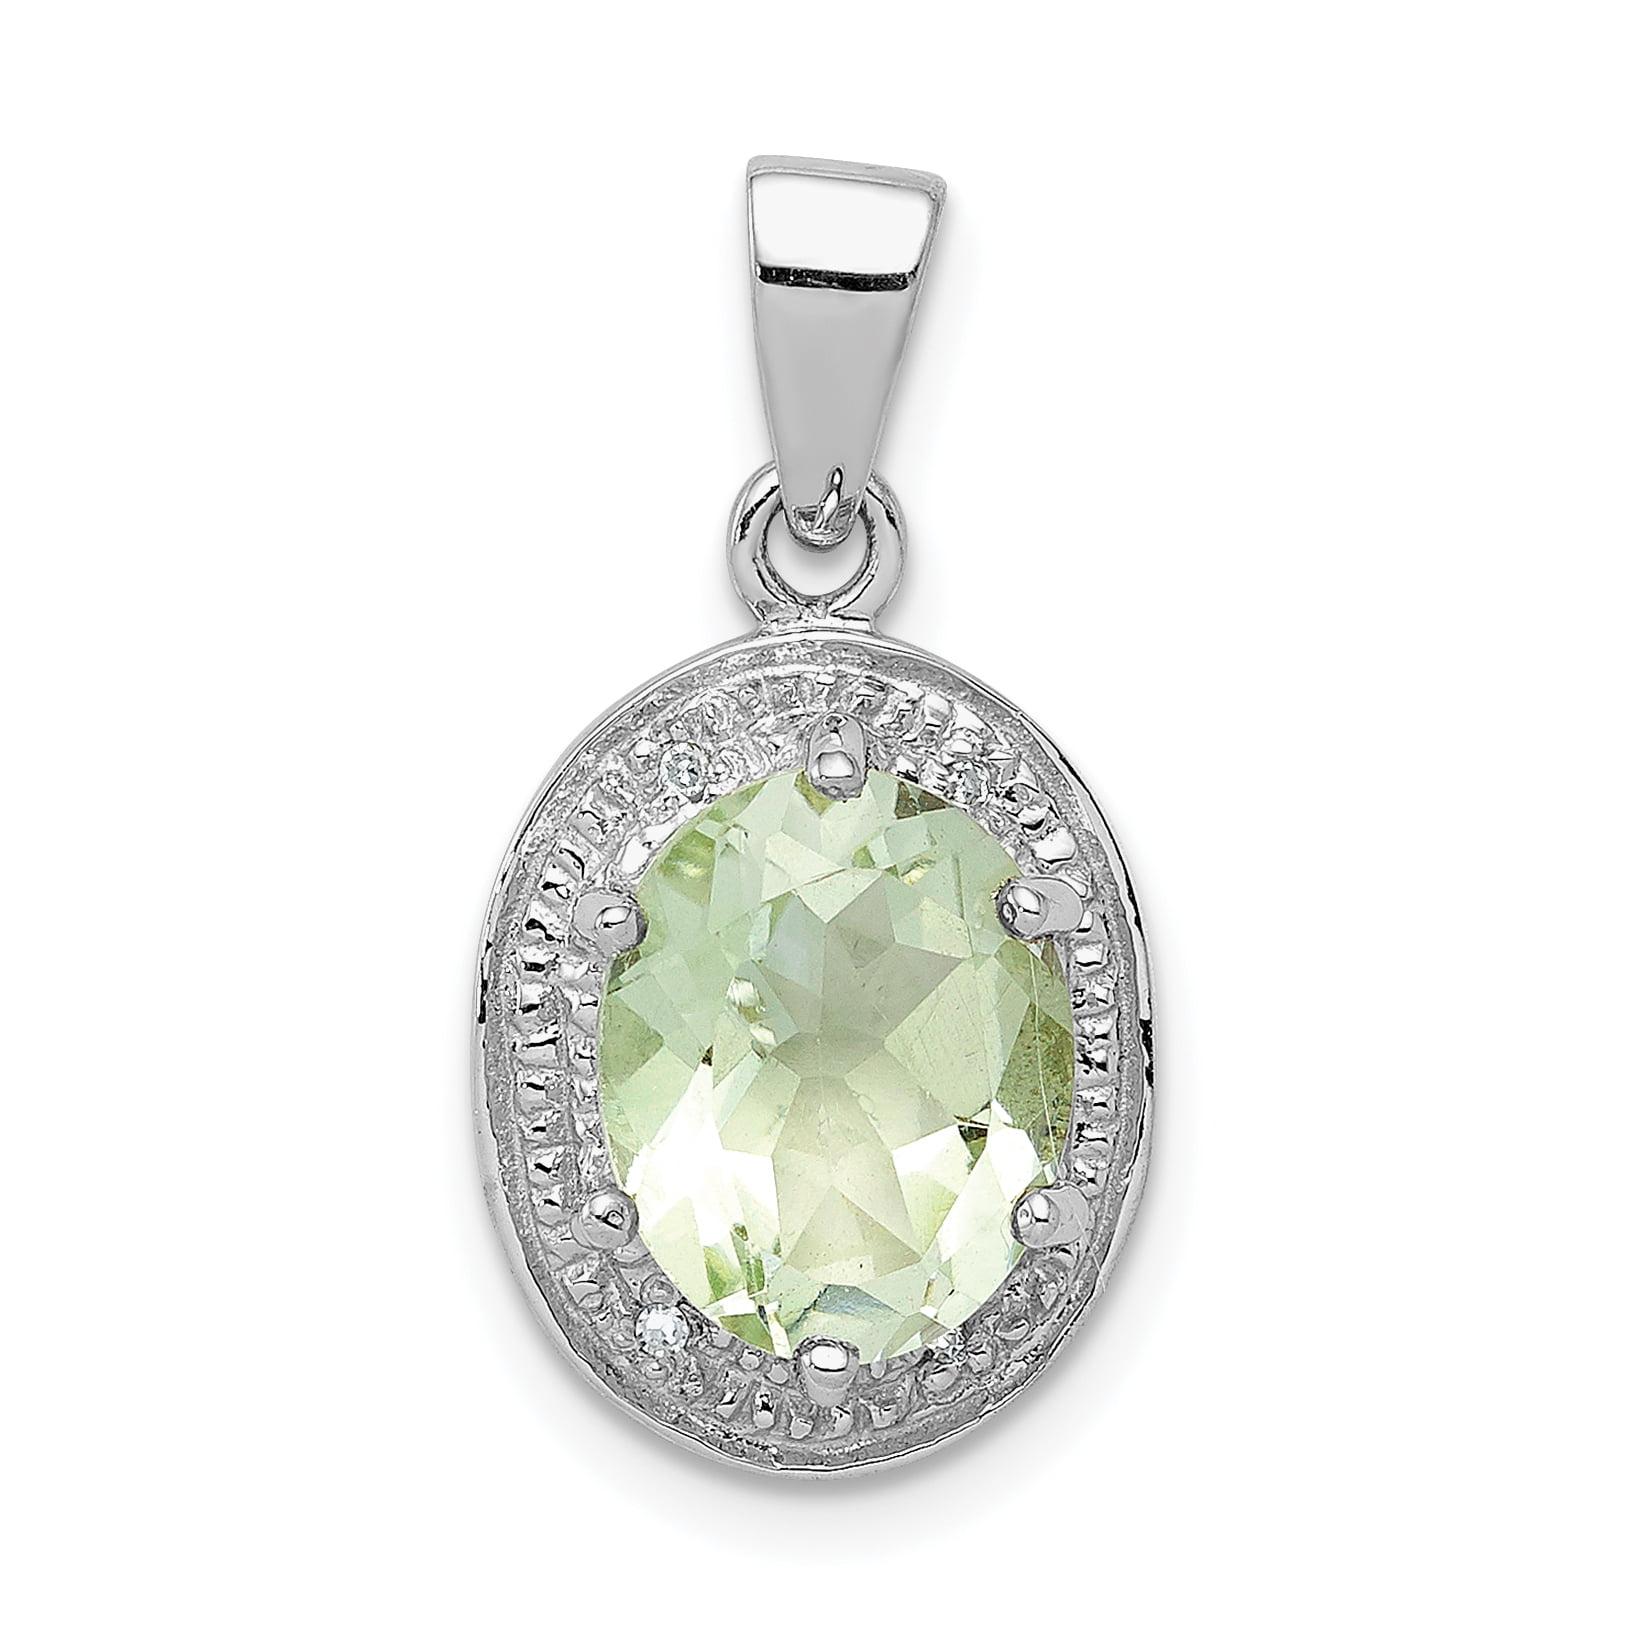 Sterling Silver Green Quartz Charm Pendant